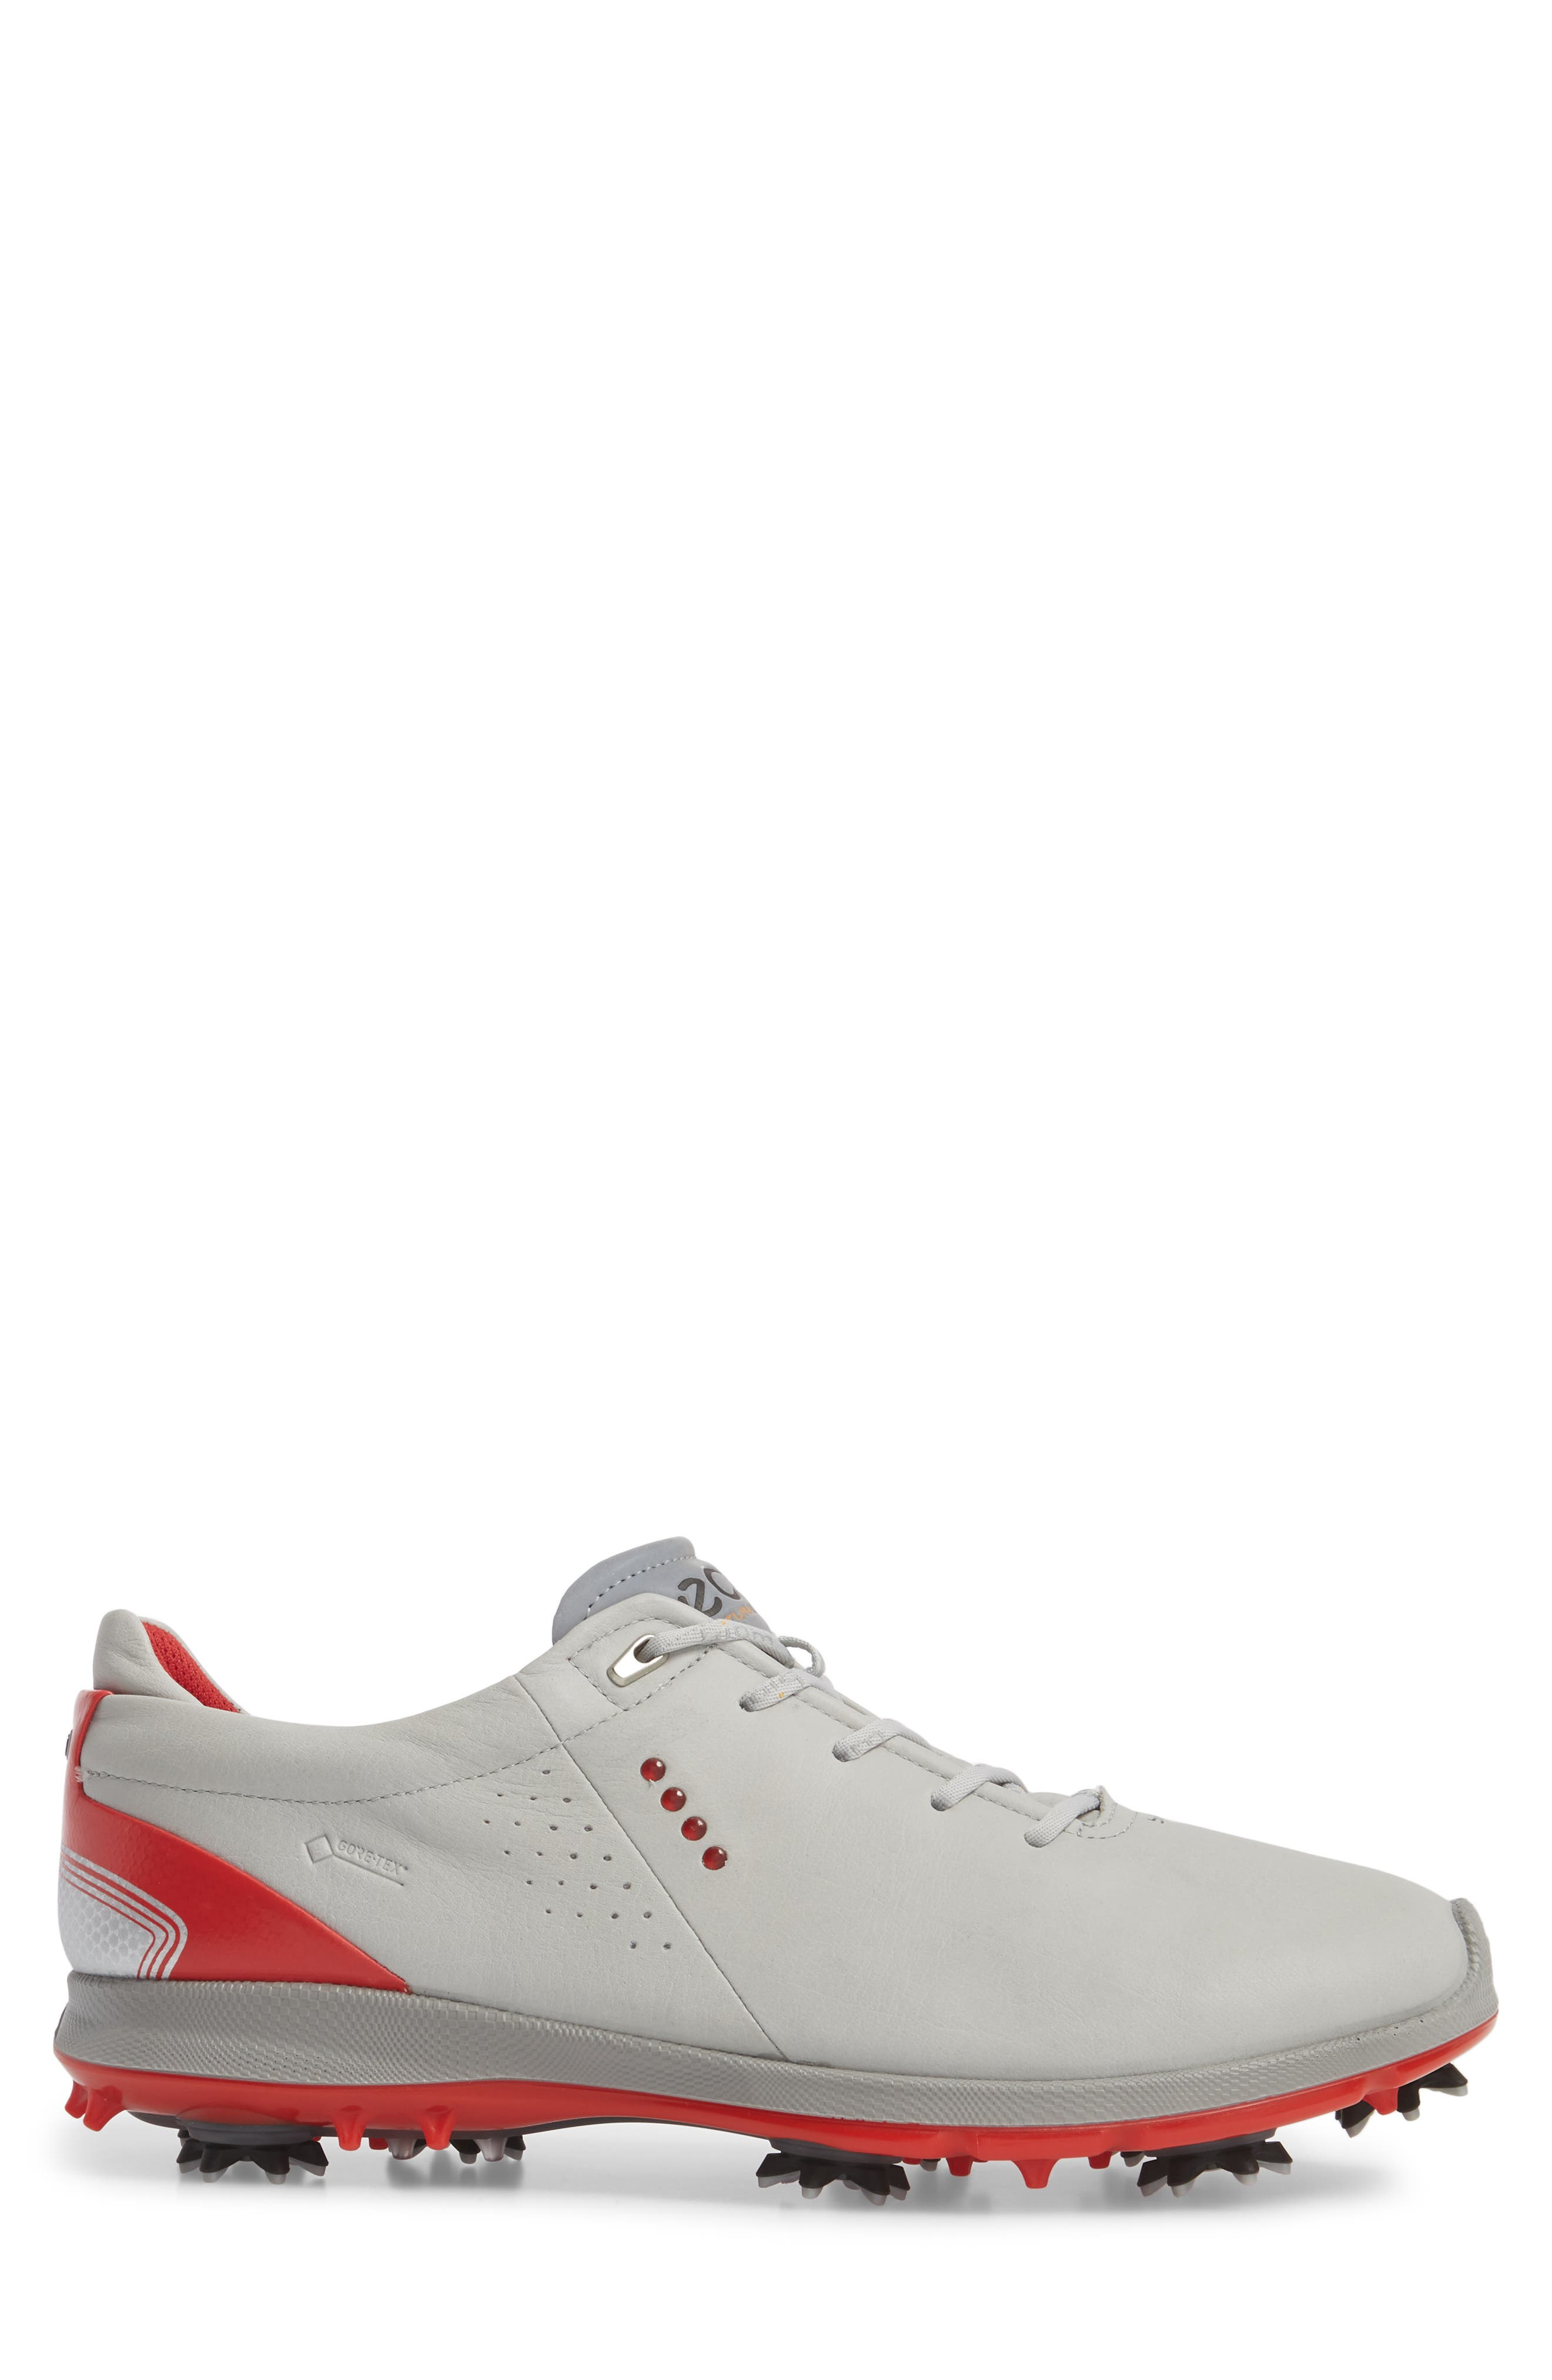 BIOM G 2 Free Gore-Tex<sup>®</sup> Golf Shoe,                             Alternate thumbnail 3, color,                             CONCRETE/ SCARLET LEATHER